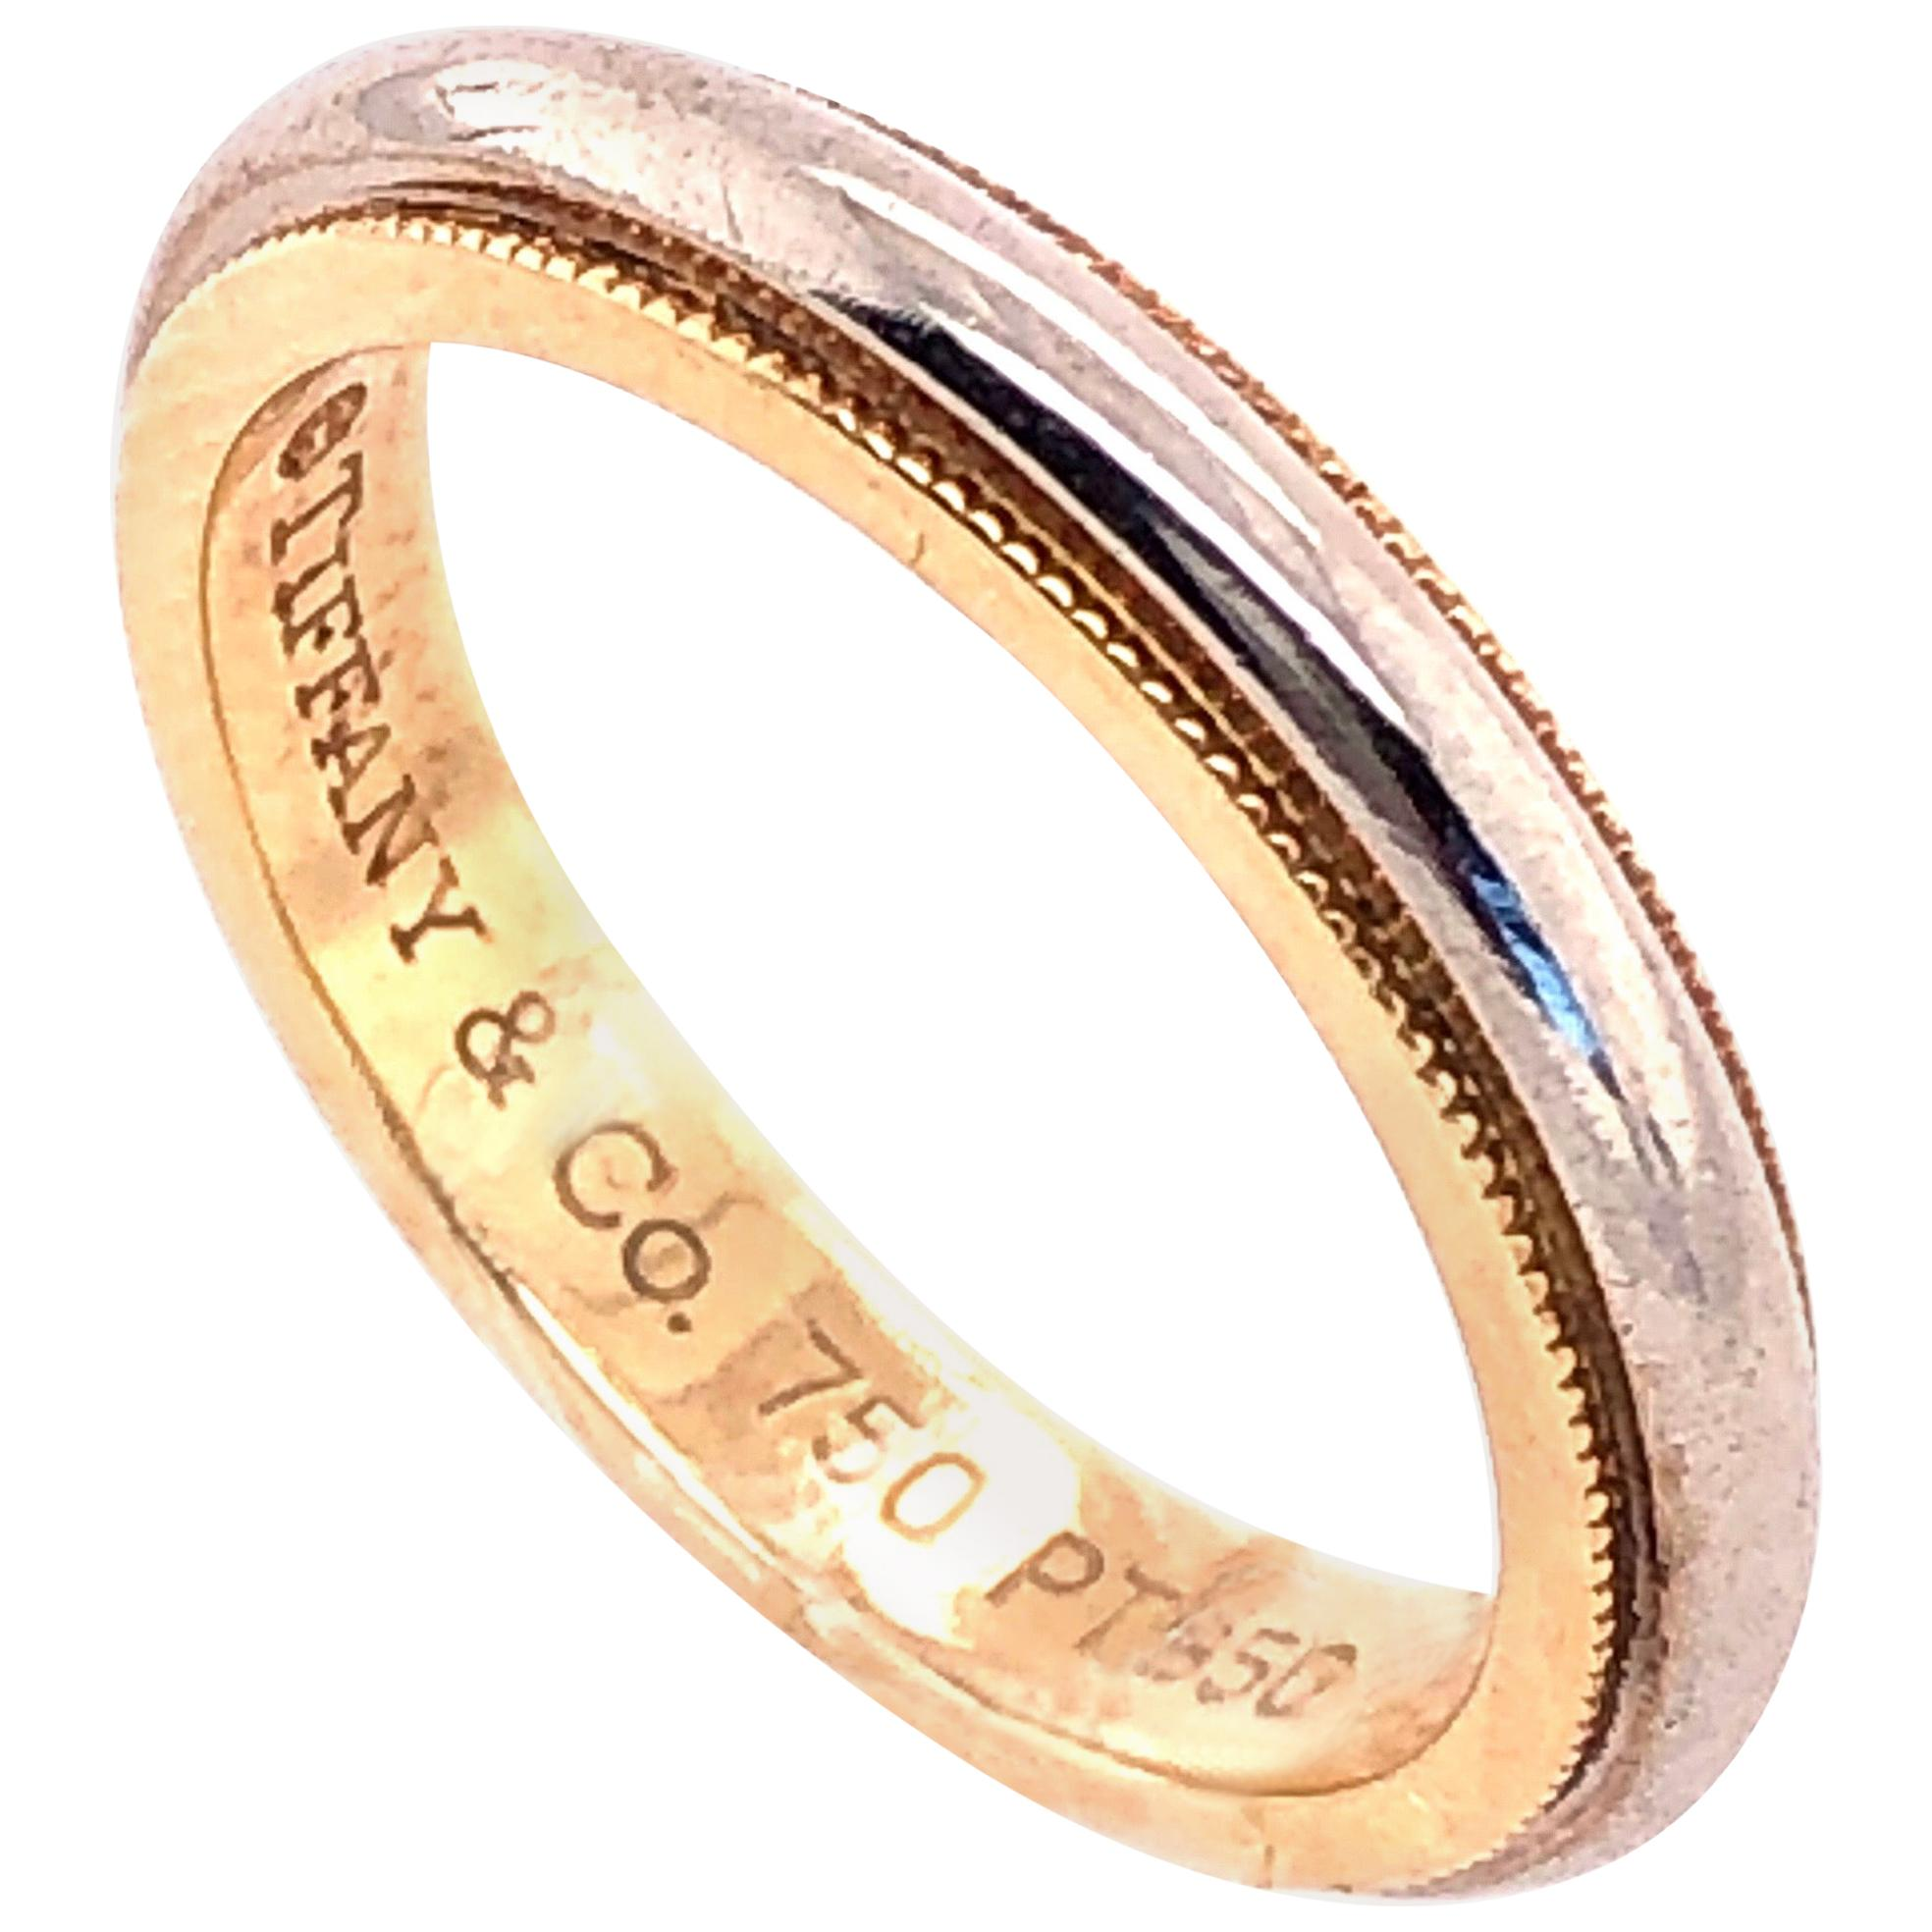 Platinum Gold Tiffany & Co. Band or Wedding Ring